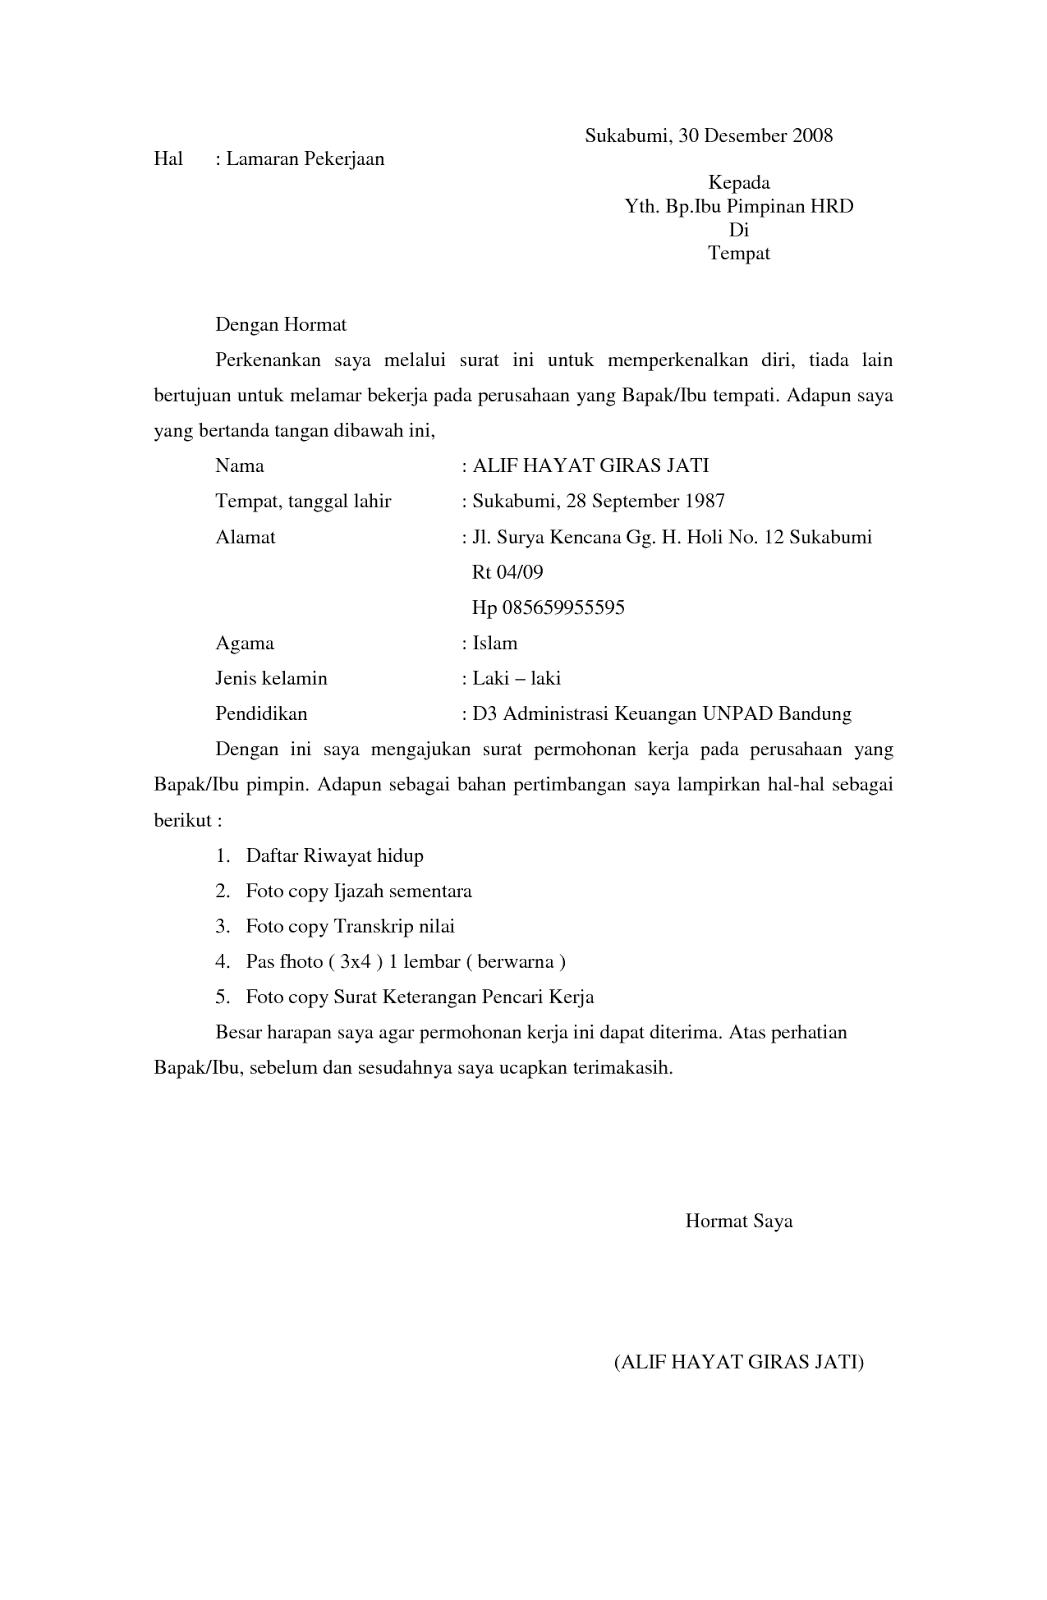 10 Surat Lamaran Kerja Formal Pimpinan, Surat, Tulisan